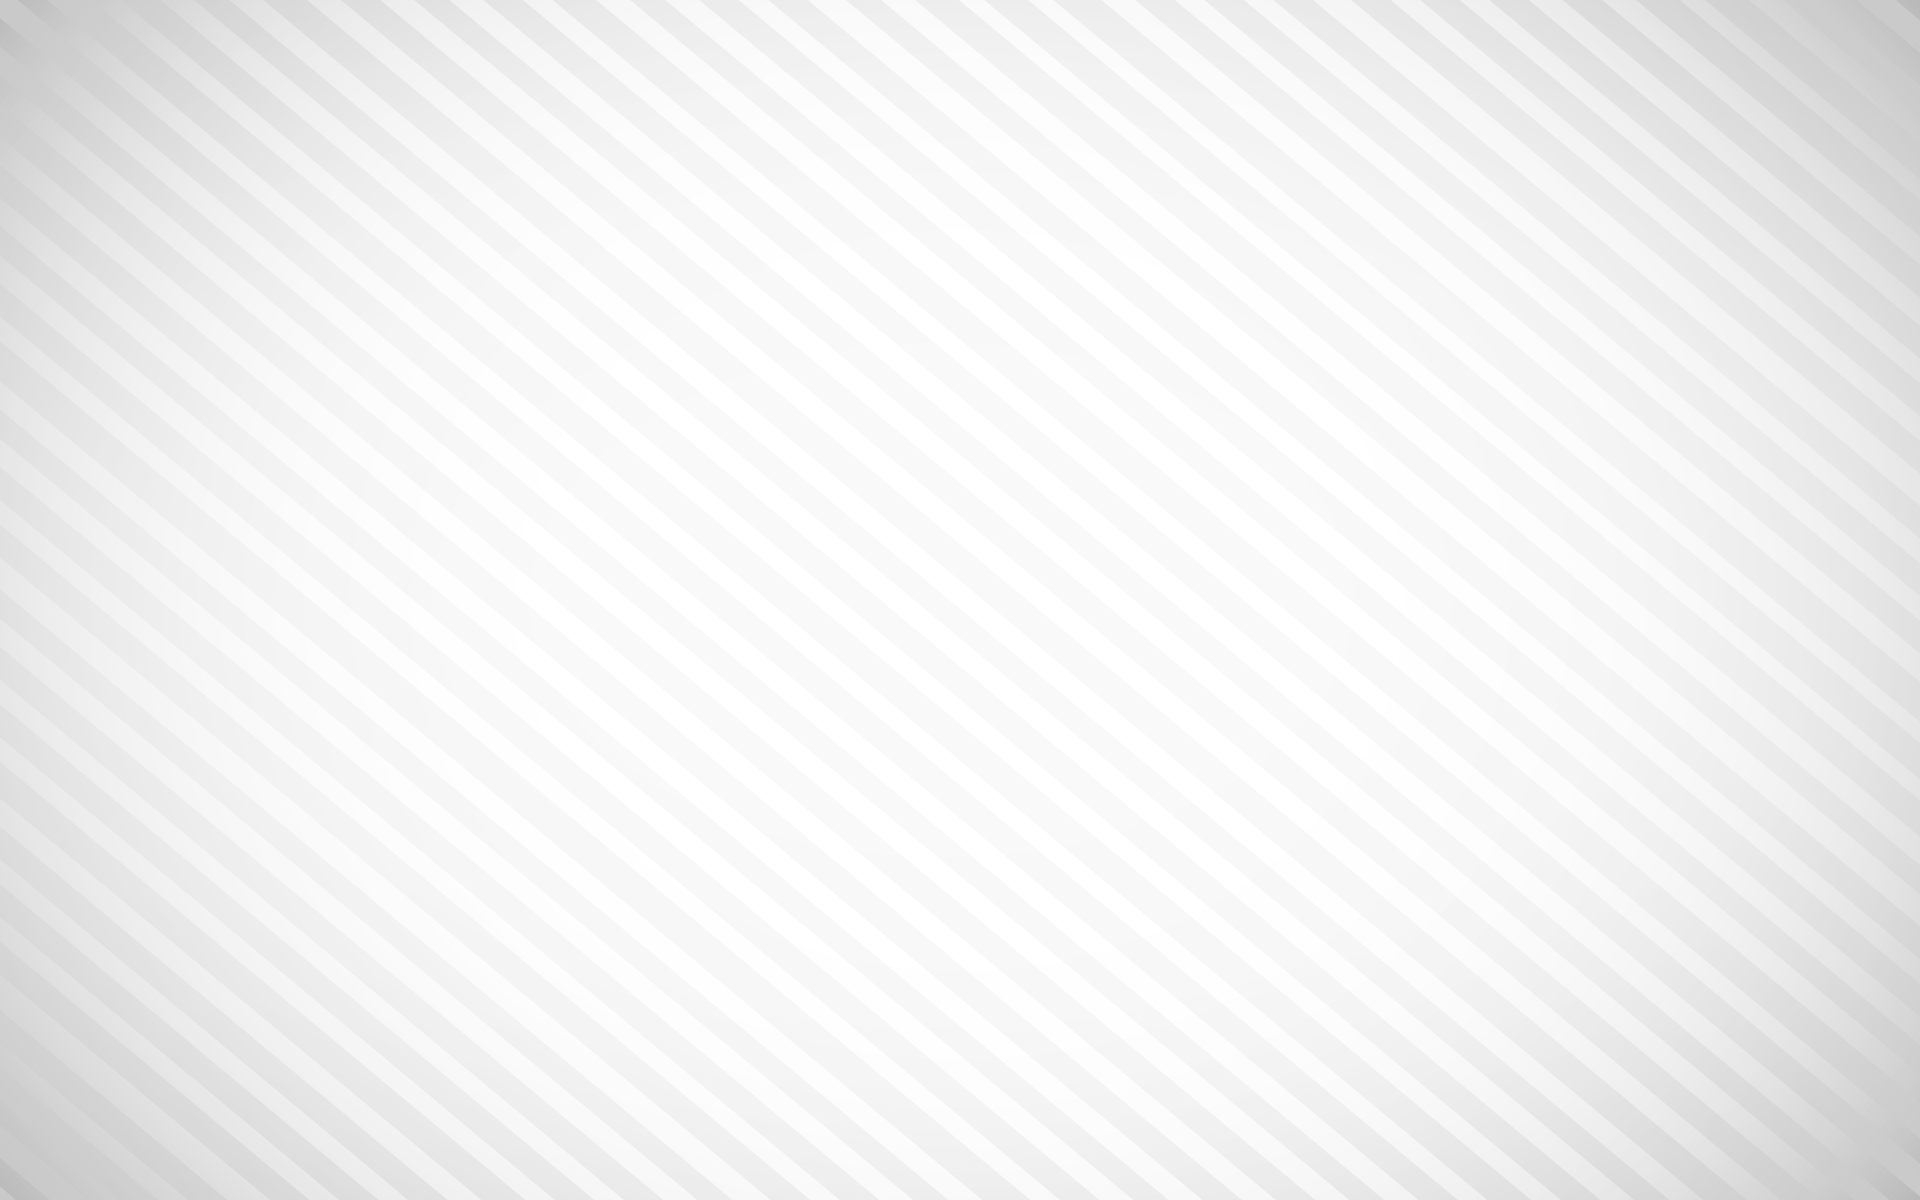 White Background Wallpaper HD - WallpaperSafari